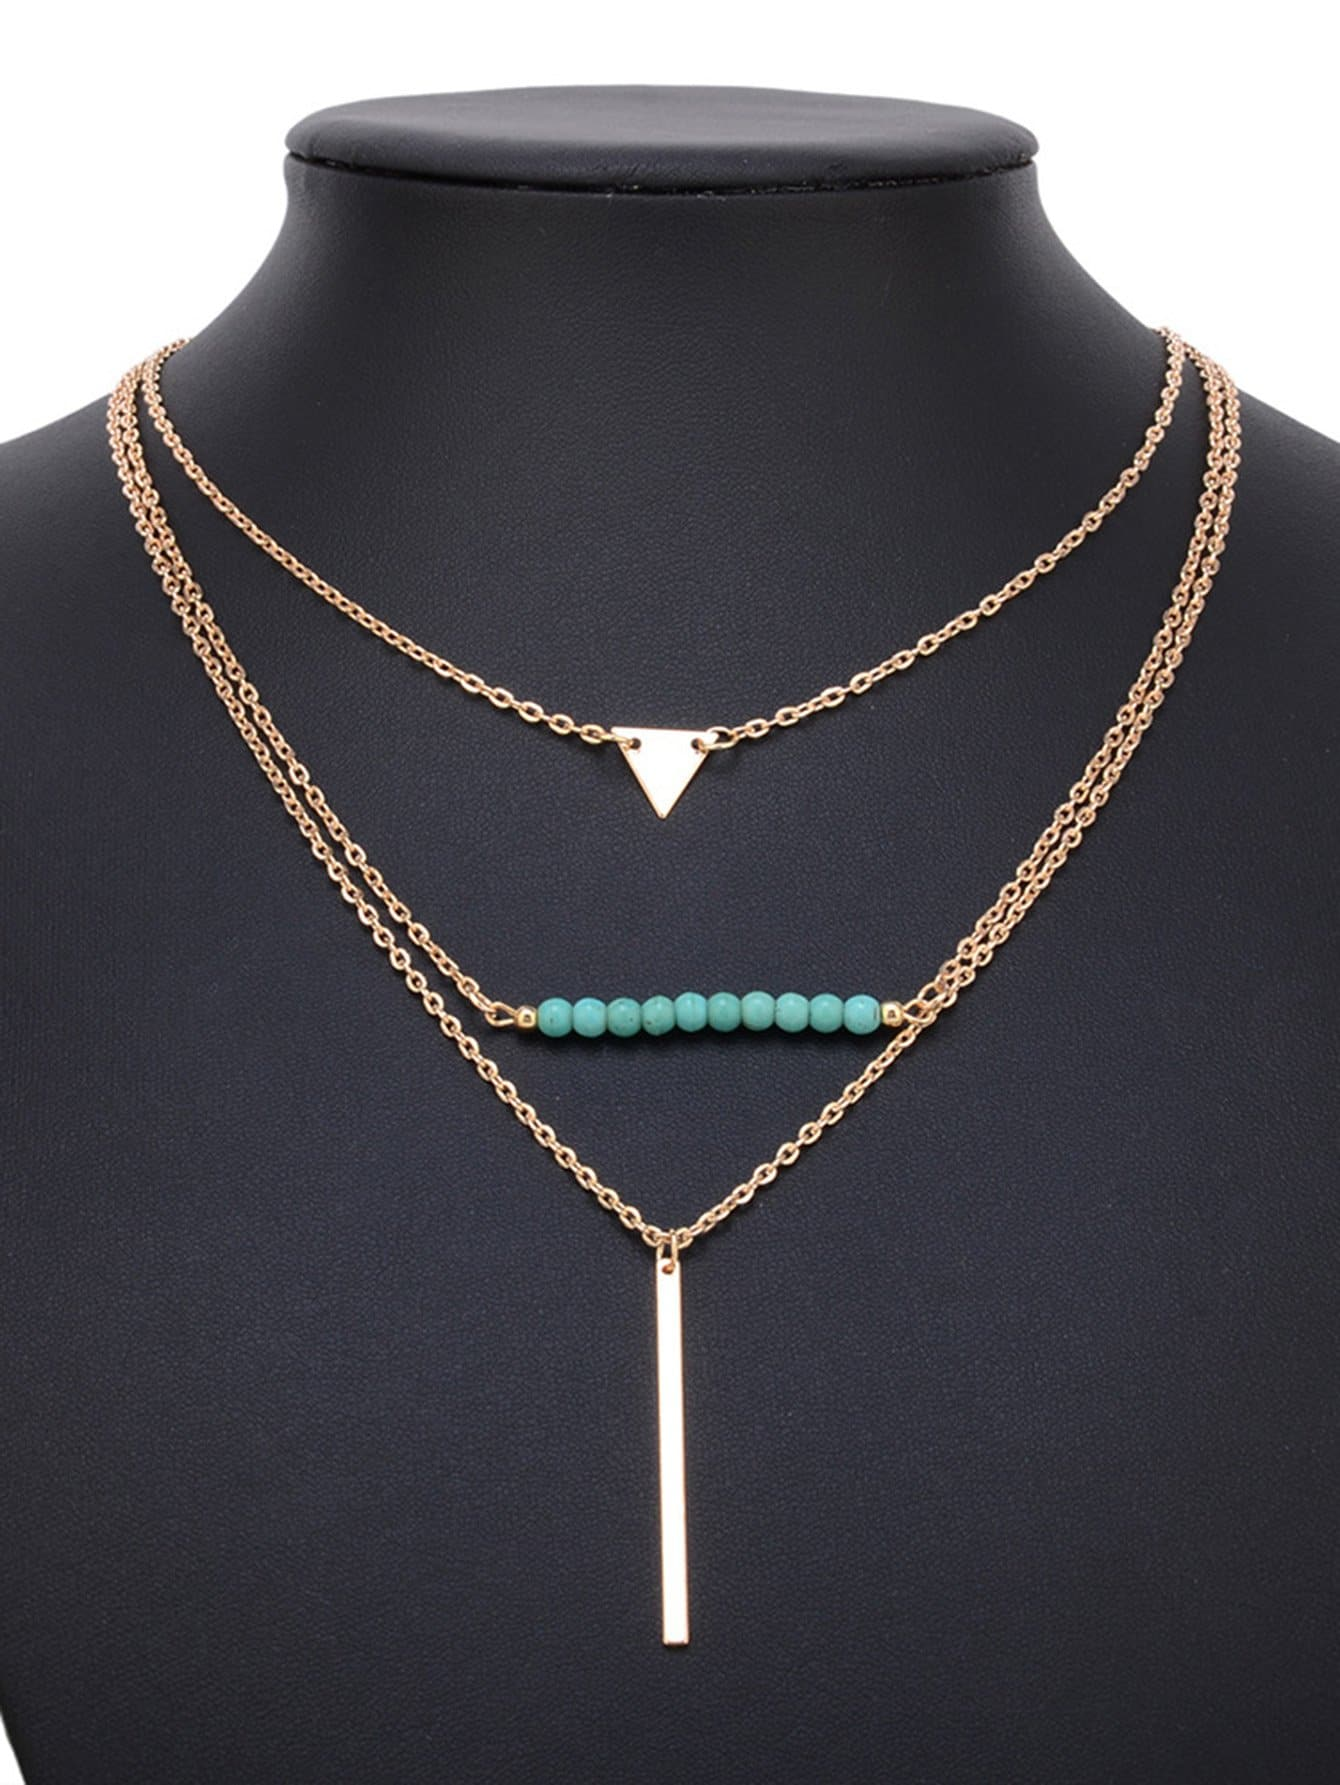 Bar Anhänger geschichteten Kette Halskette